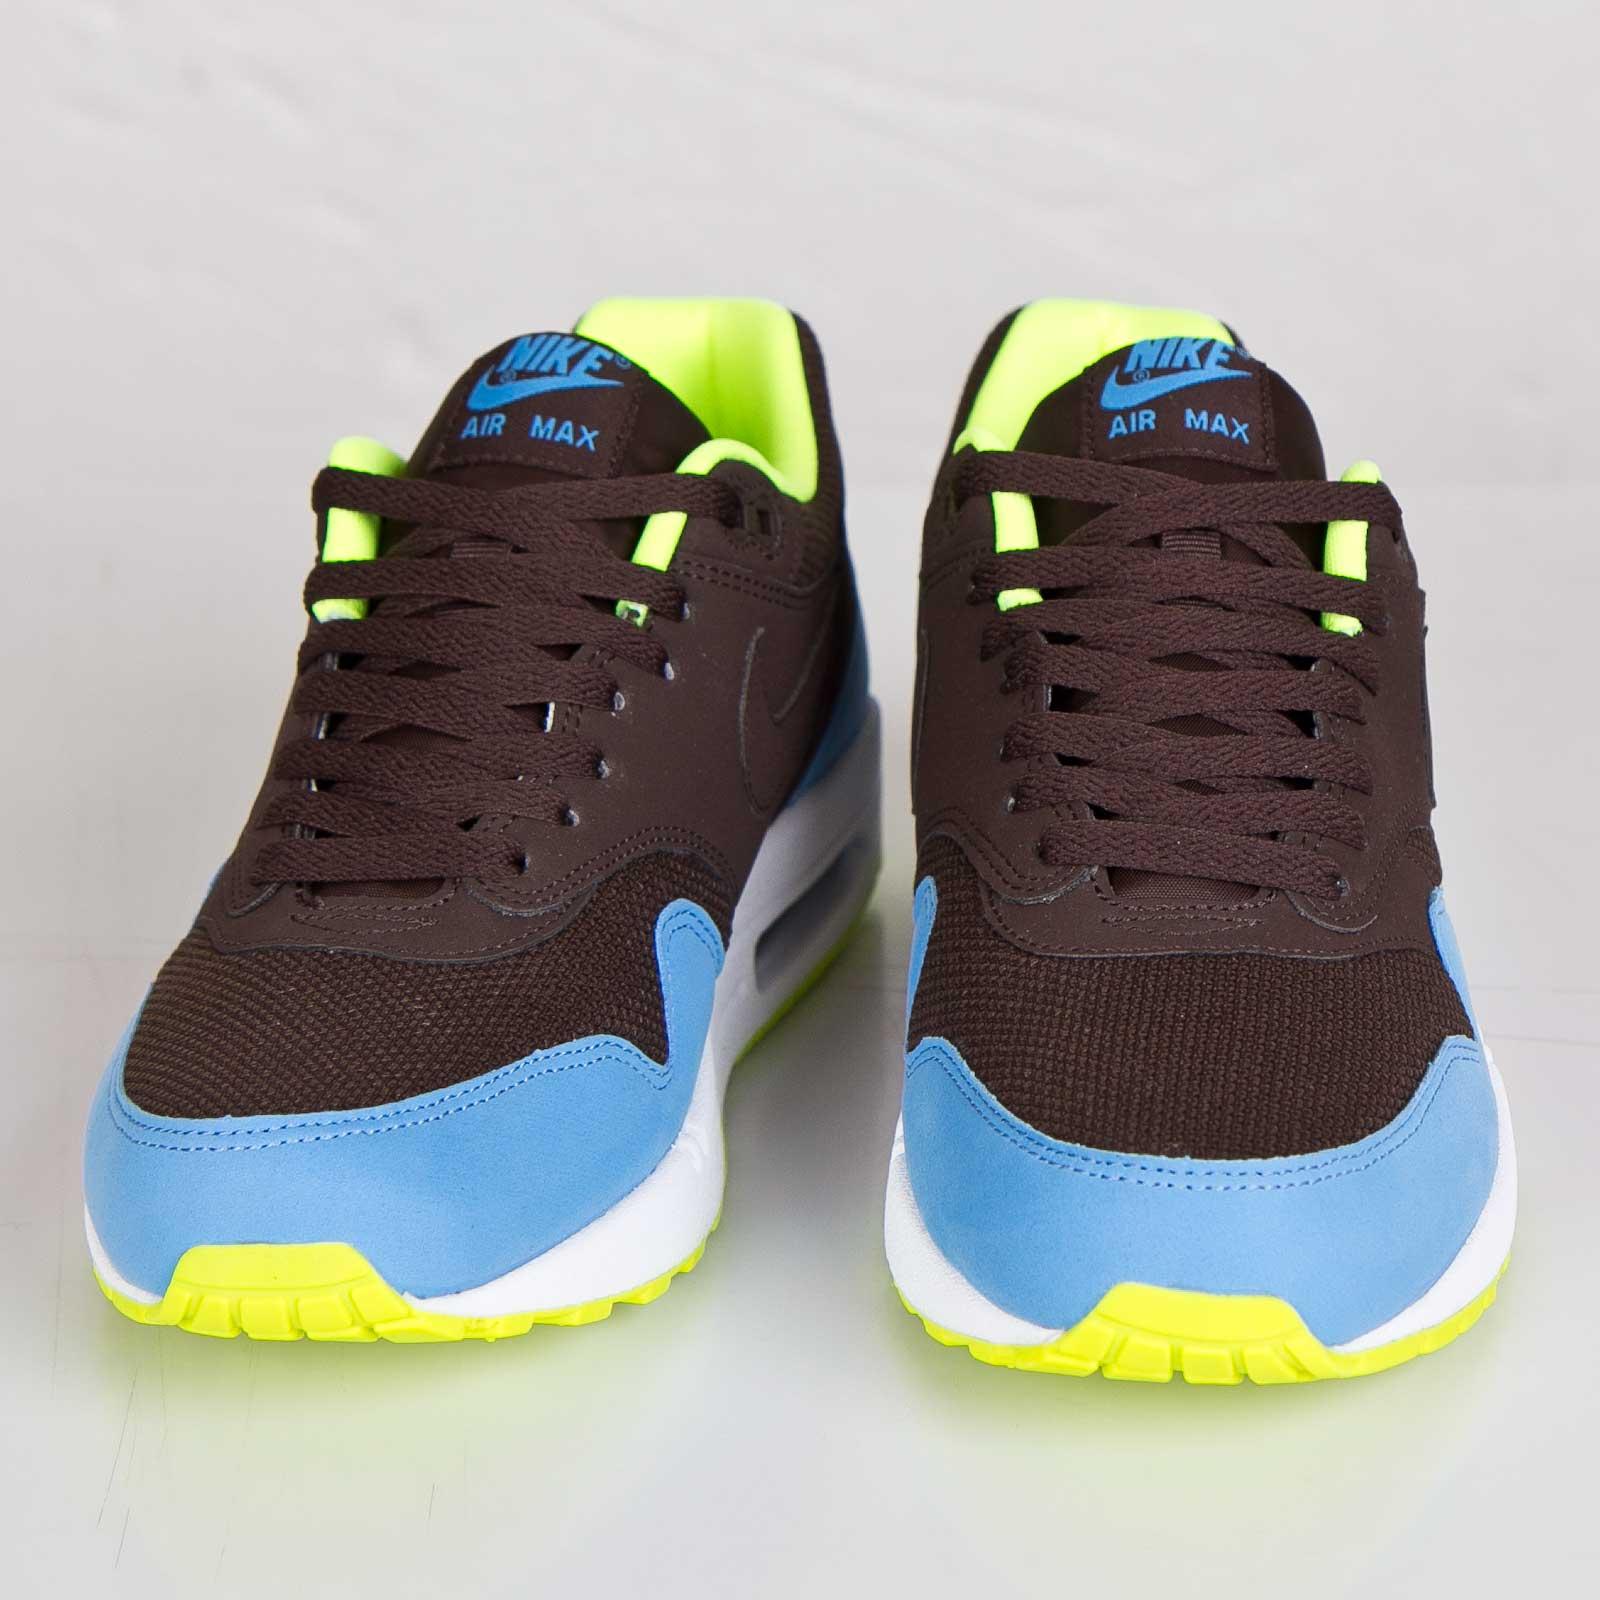 Nike Air Max 1 Essential - 537383-201 - SNS   sneakers ...